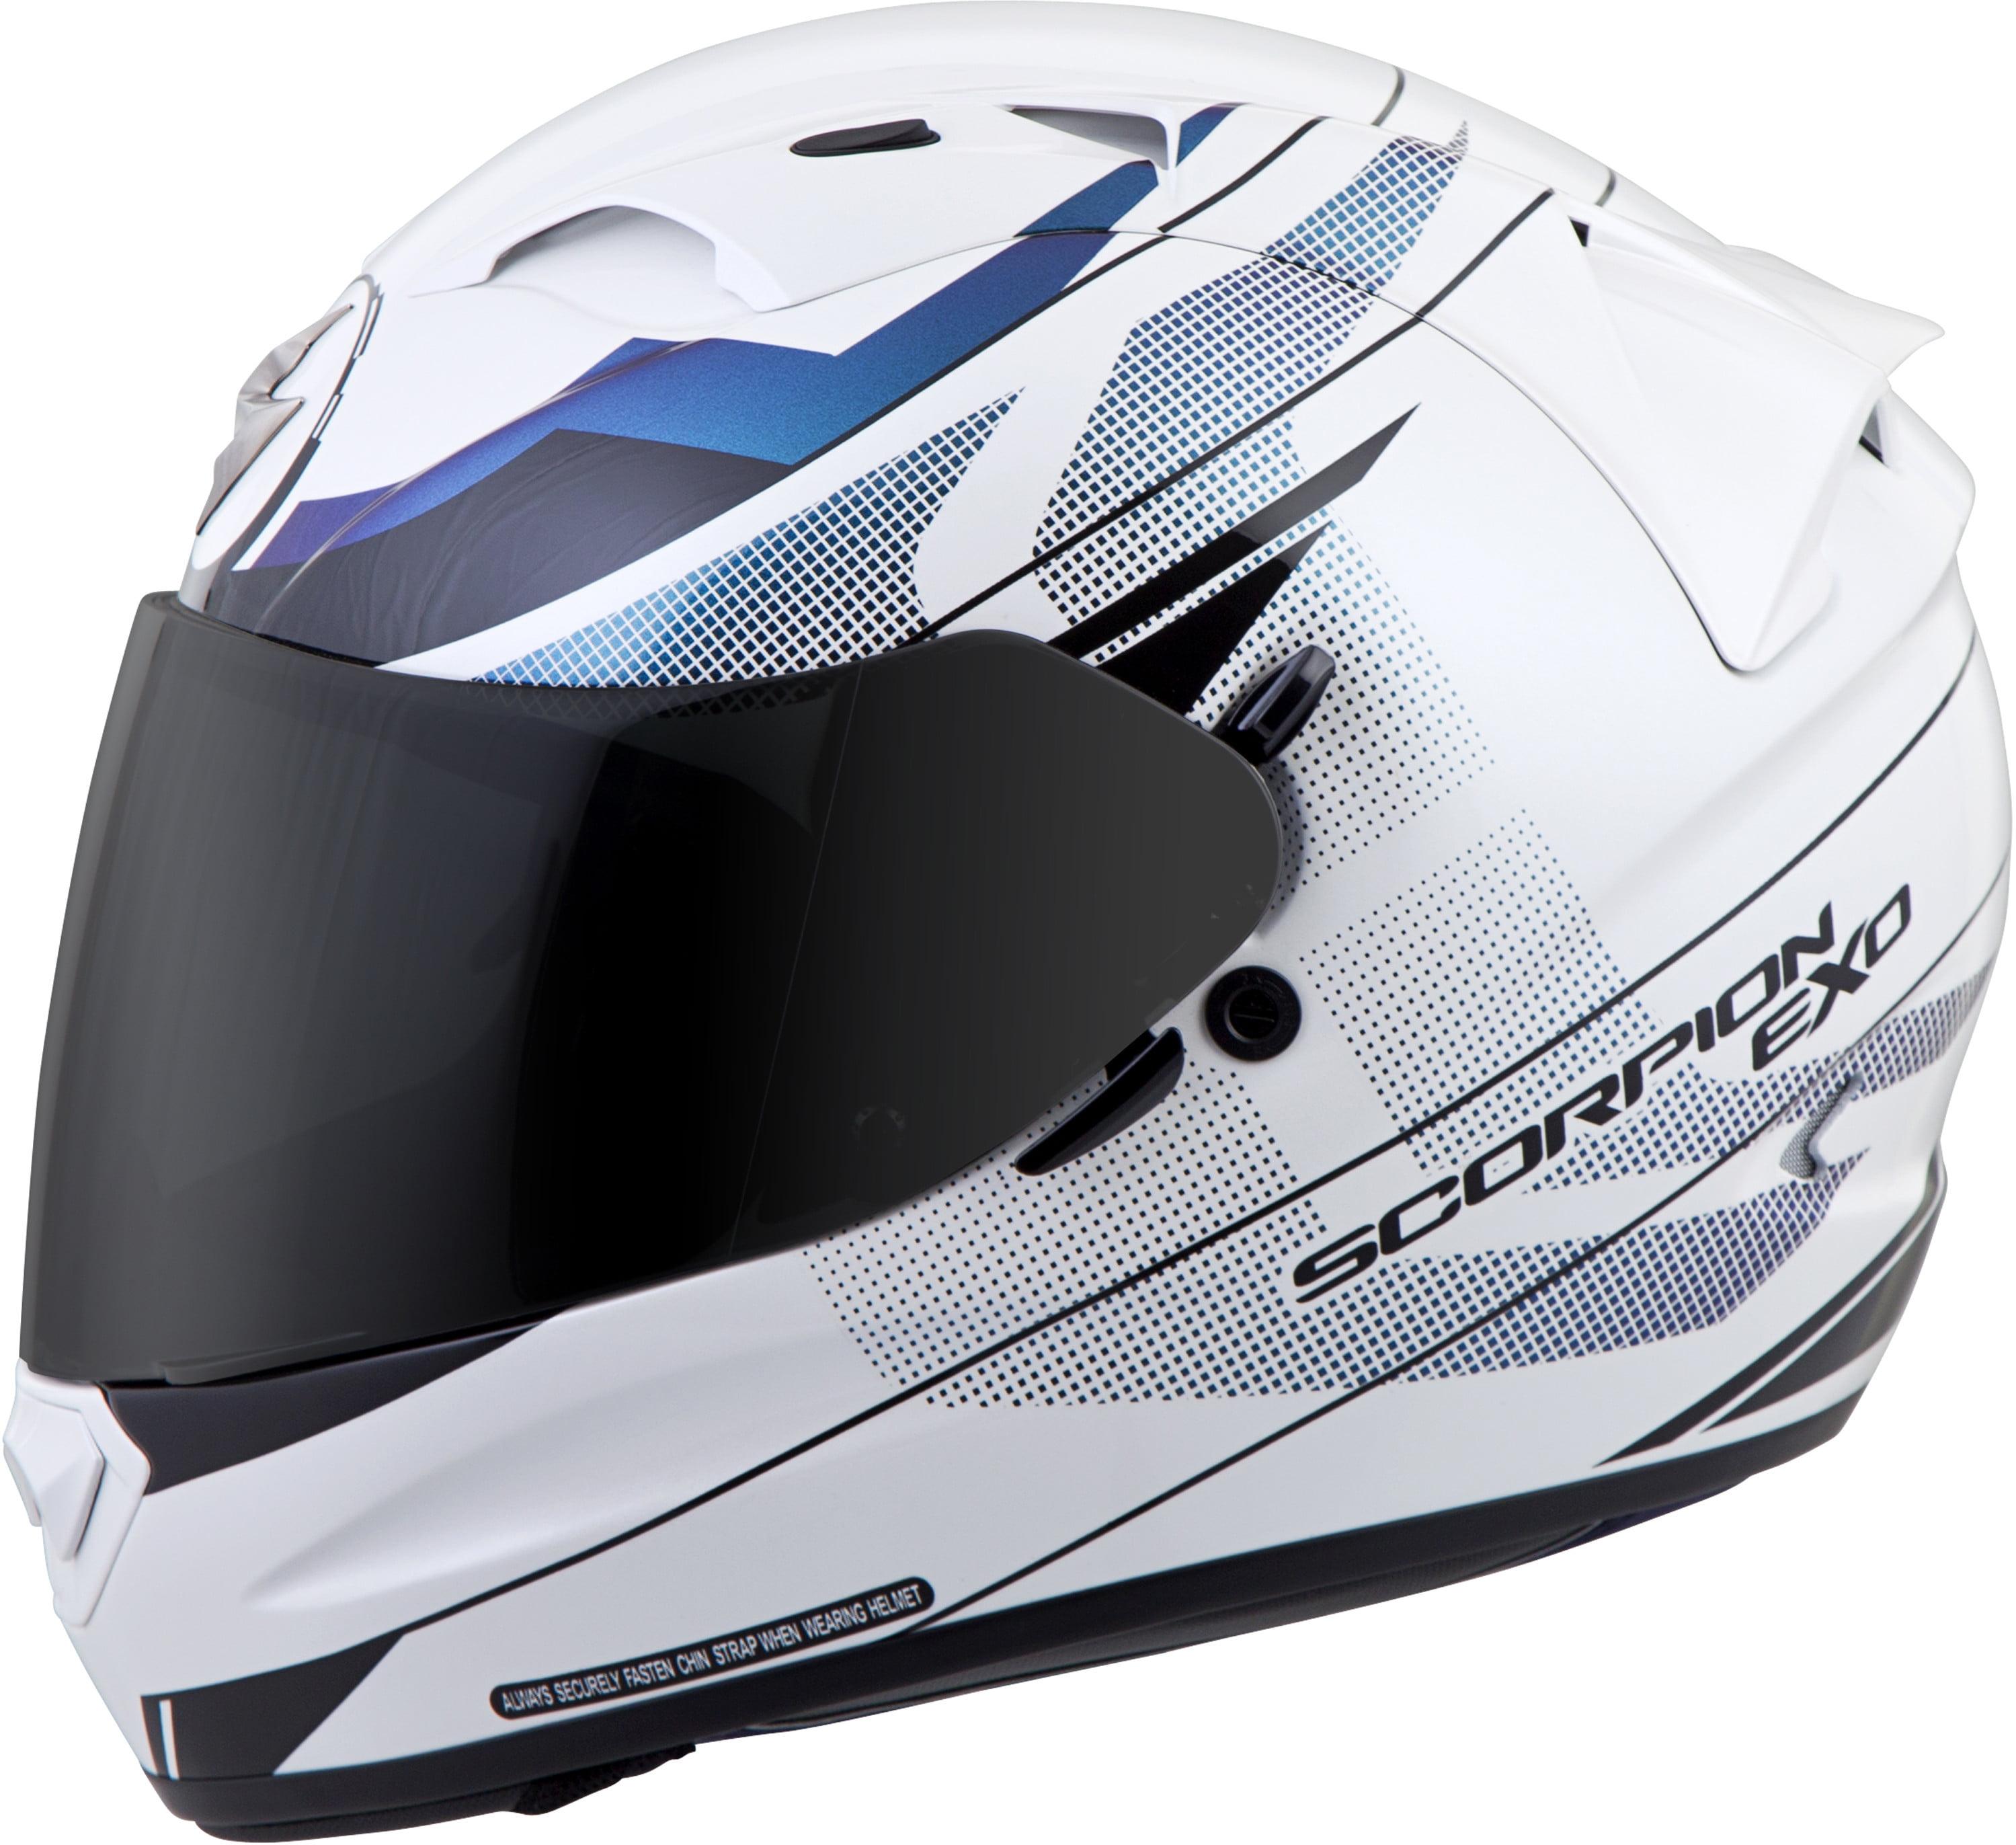 Scorpion KWIKWICK Liner//Cheek Pads Set for EXO-T1200 Helmets Choose Size